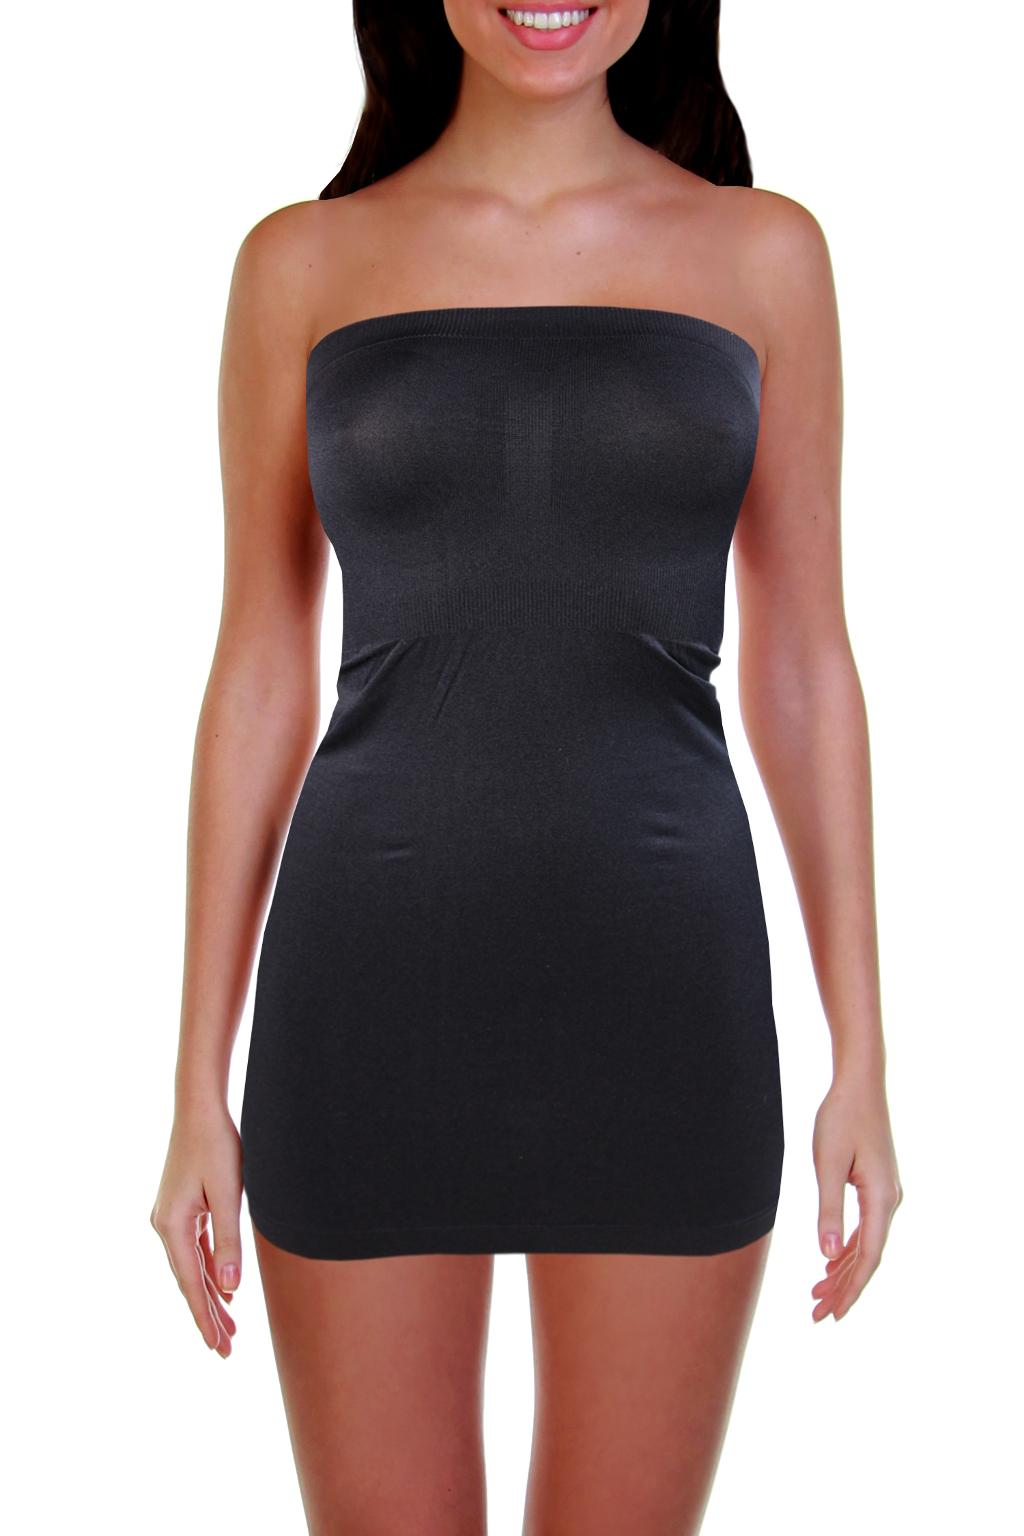 Shakira G&N šaty elastické L černá